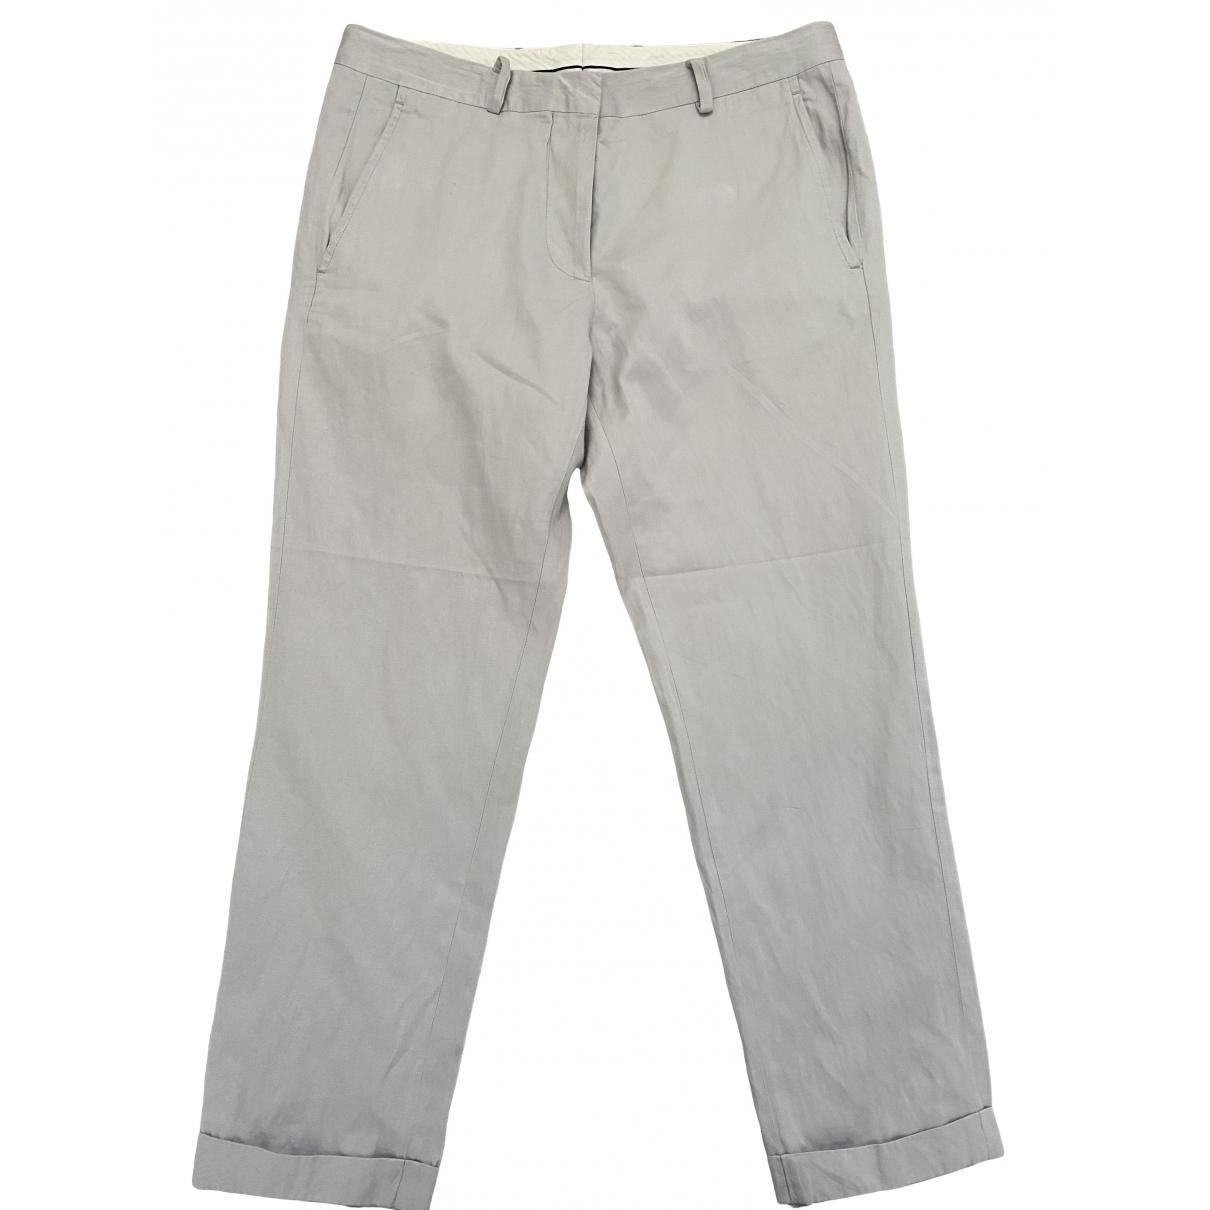 Pantalon recto Mauro Grifoni